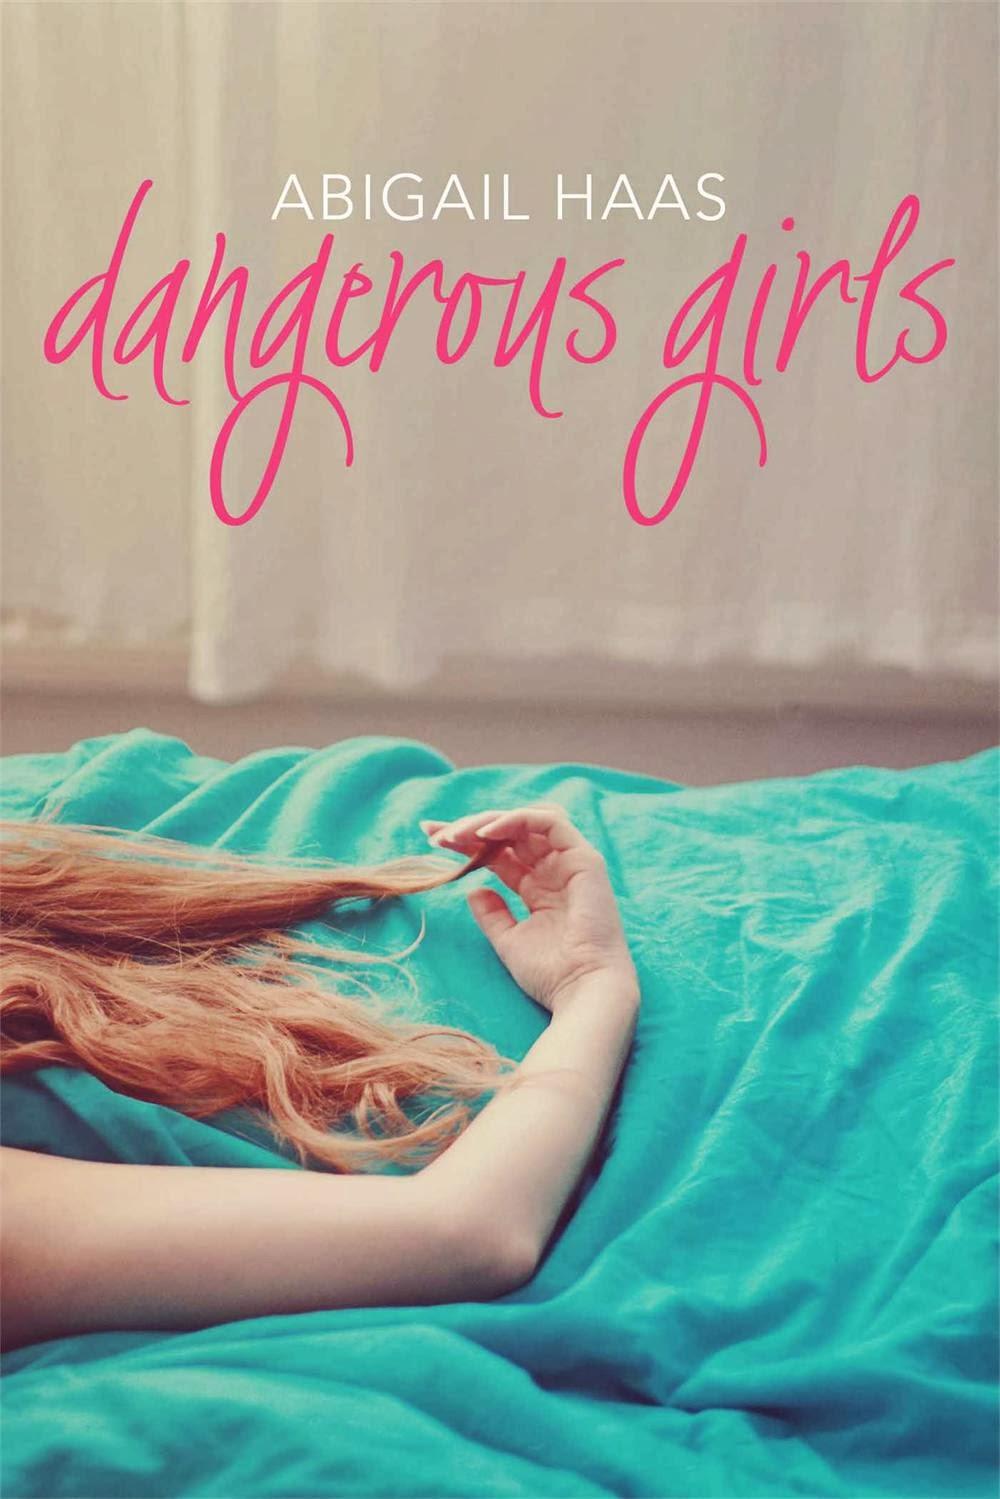 Dangerous Girls by Abigail Haas  Review     Amazon     Goodreads